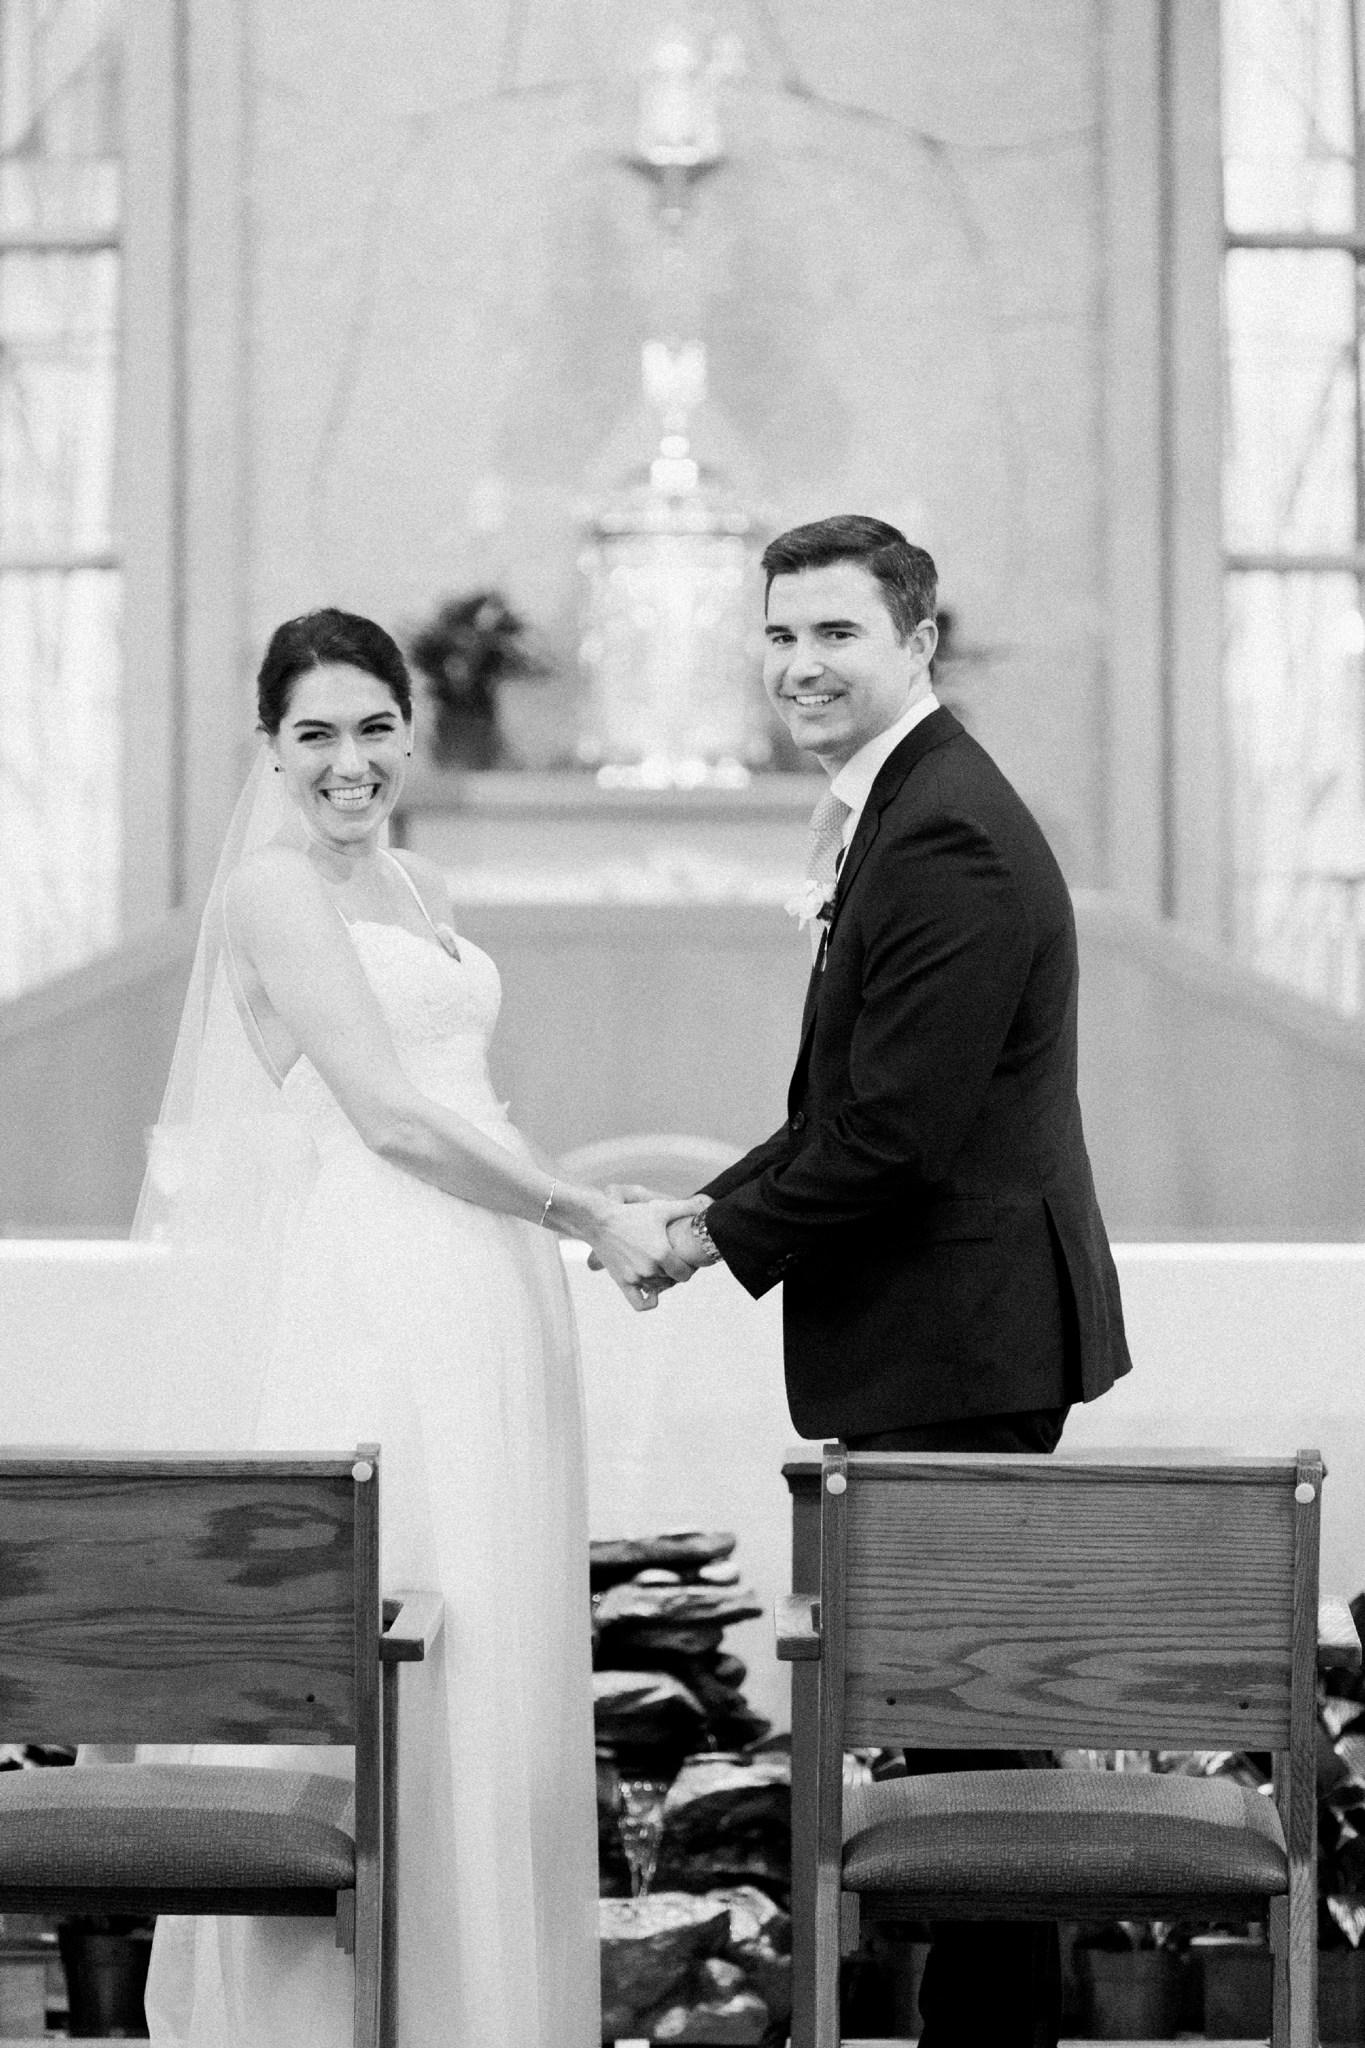 cape_cod_wedding_deborah_zoe_Photography_00028.JPG